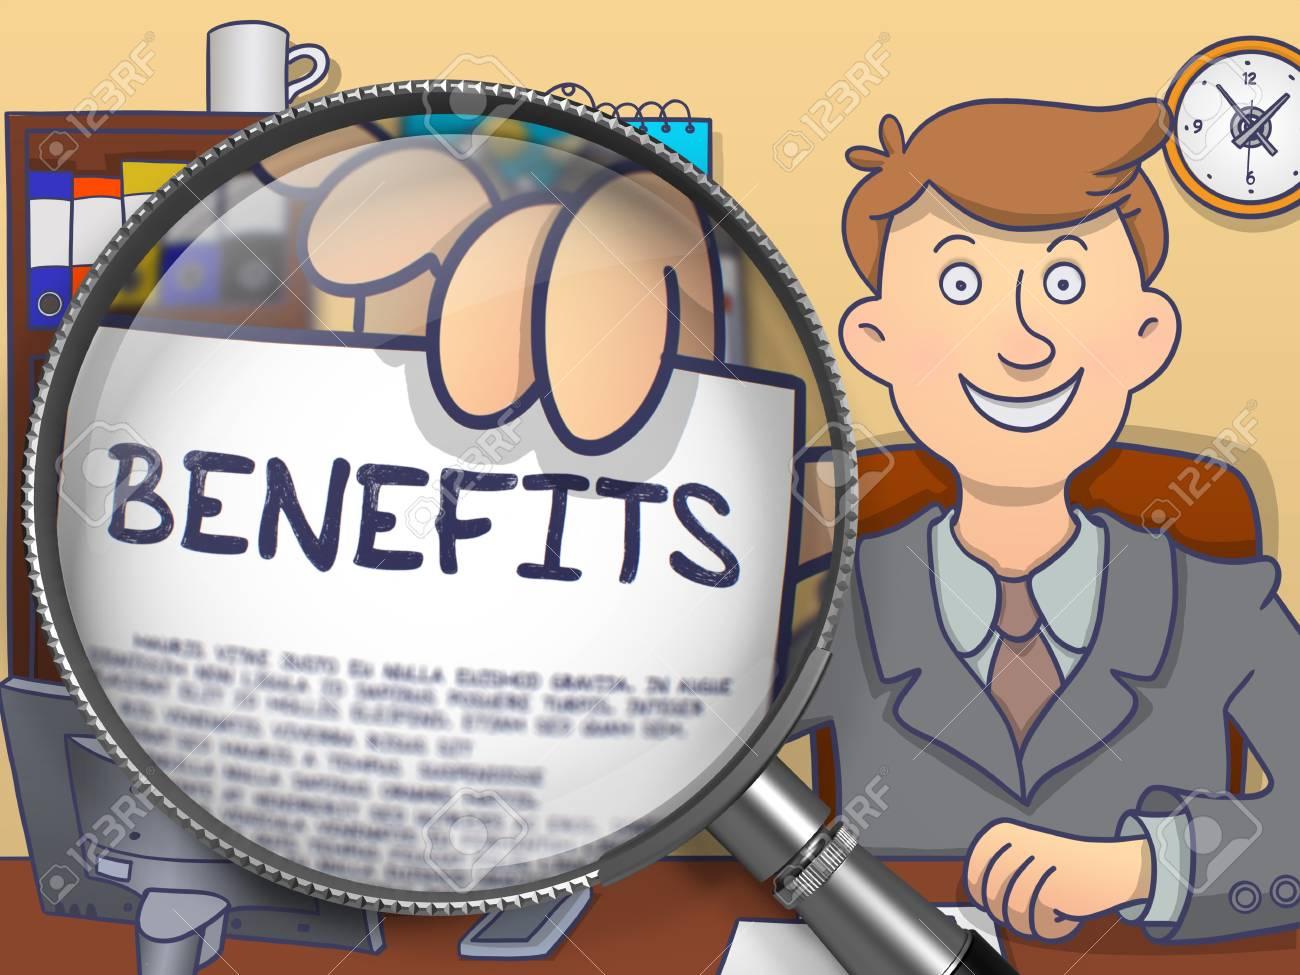 Phác thảo các lợi ích